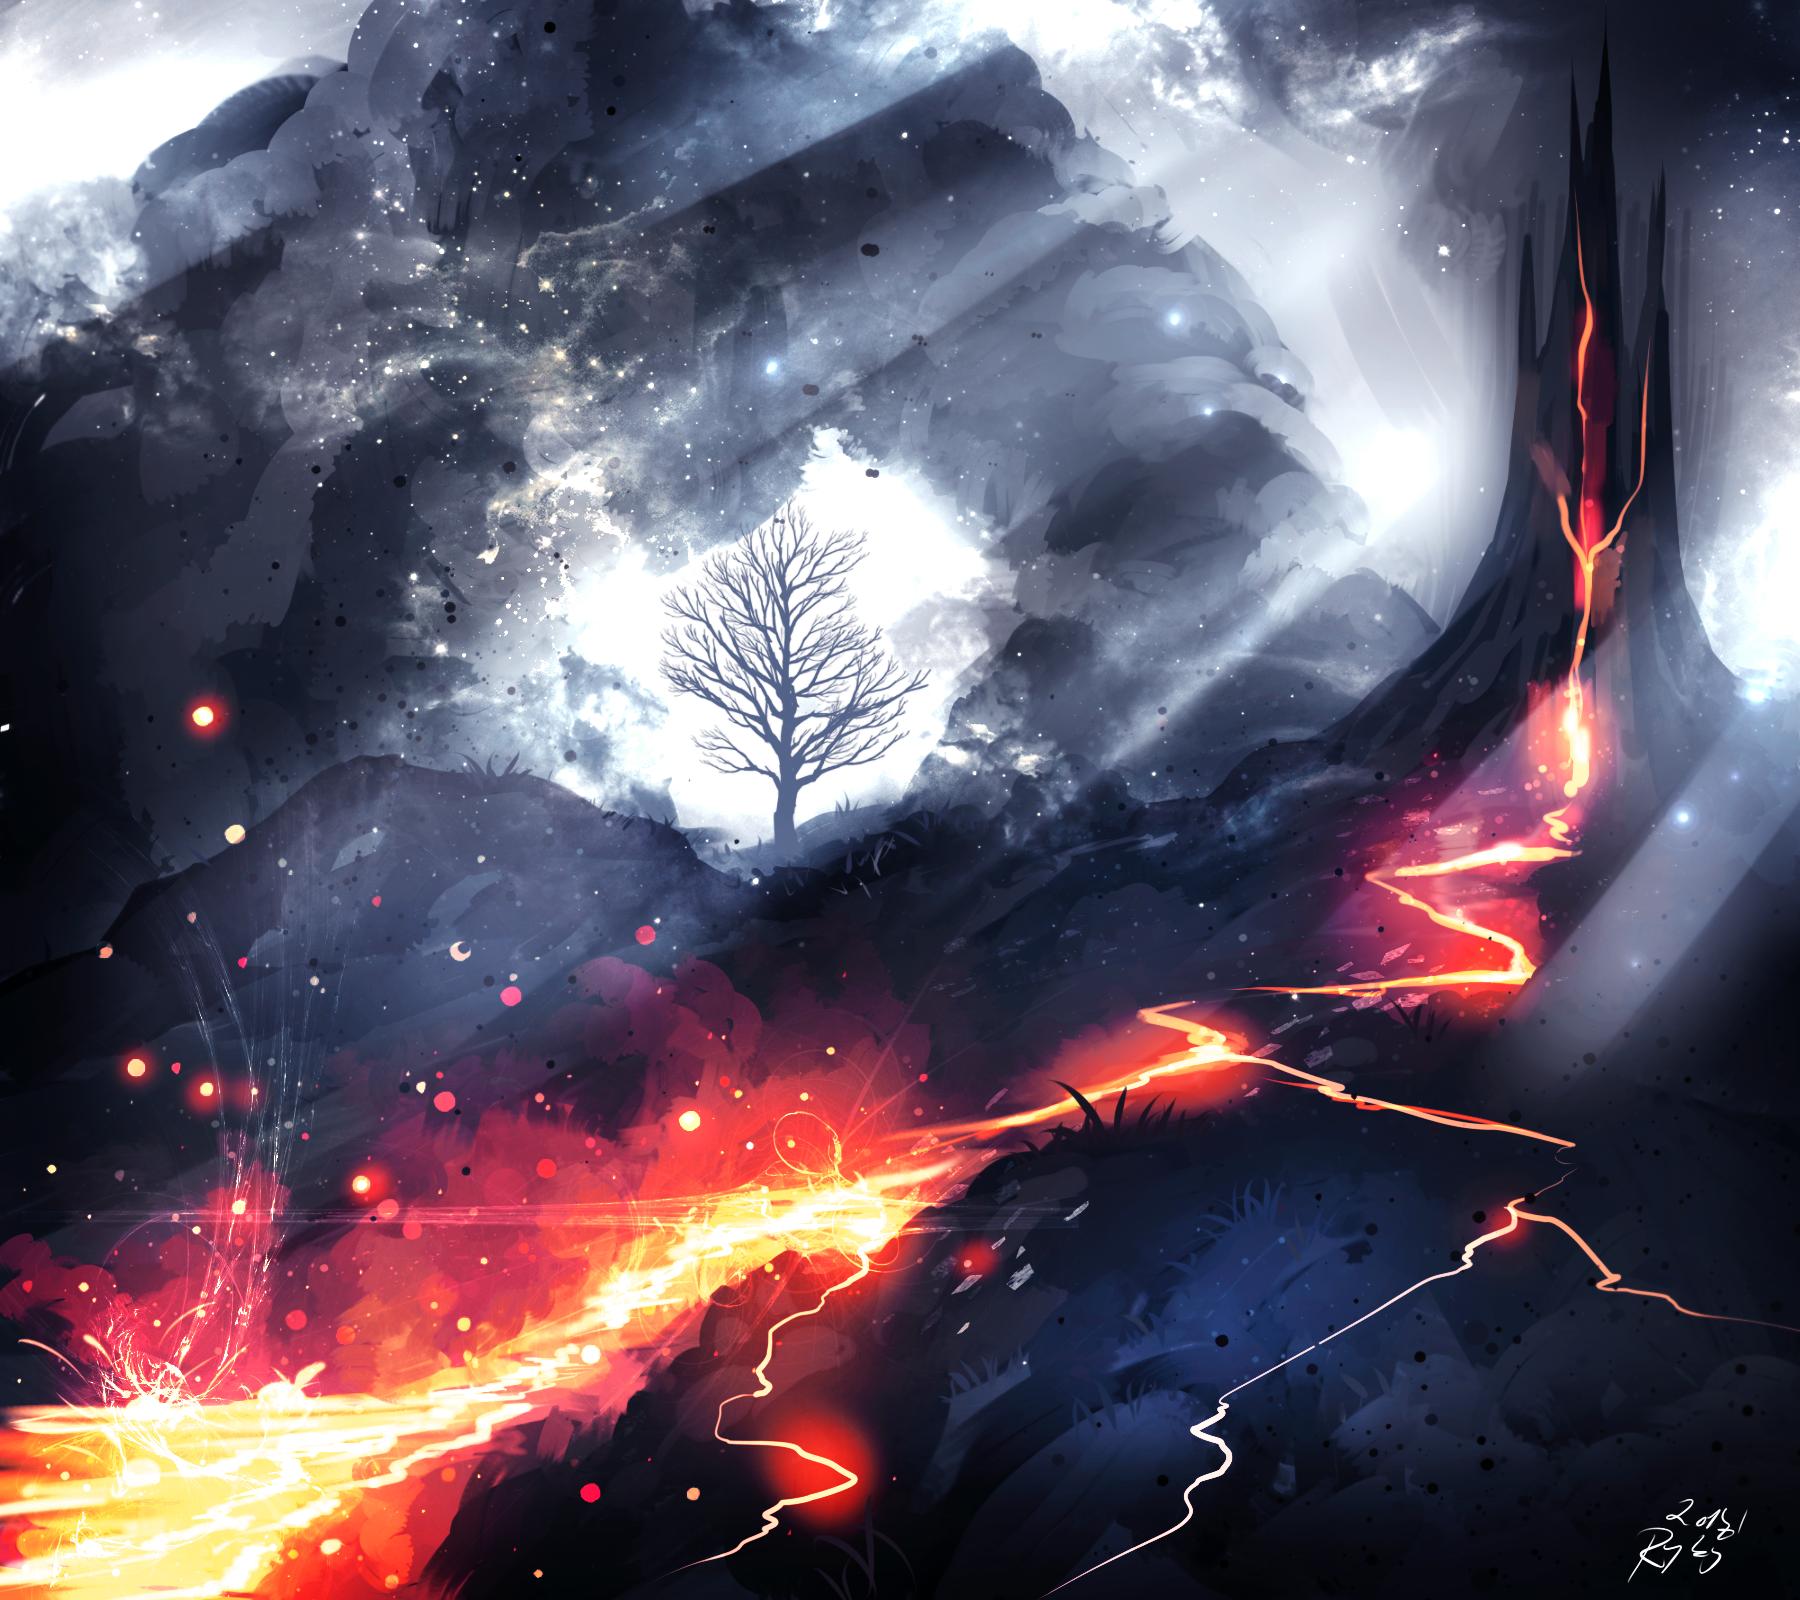 Lava by ryky